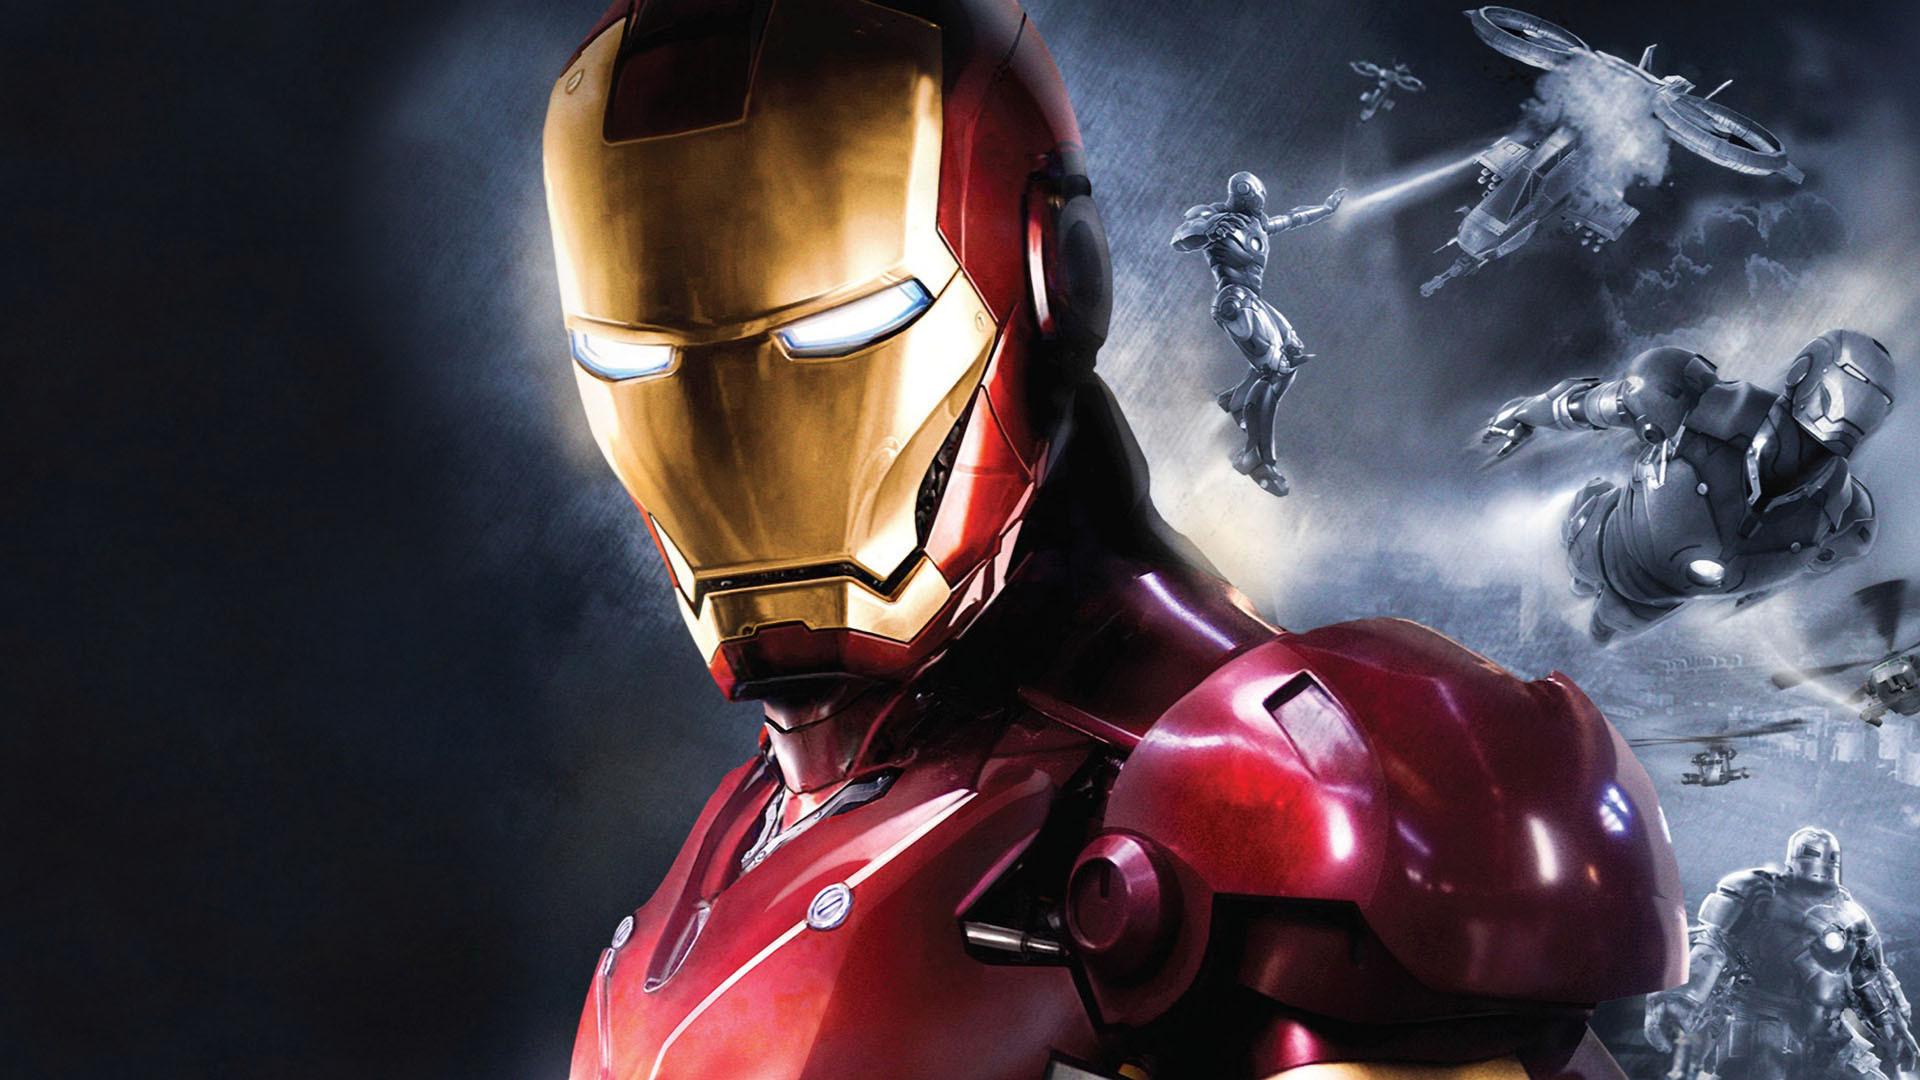 Iron Man Wallpaper For Computer